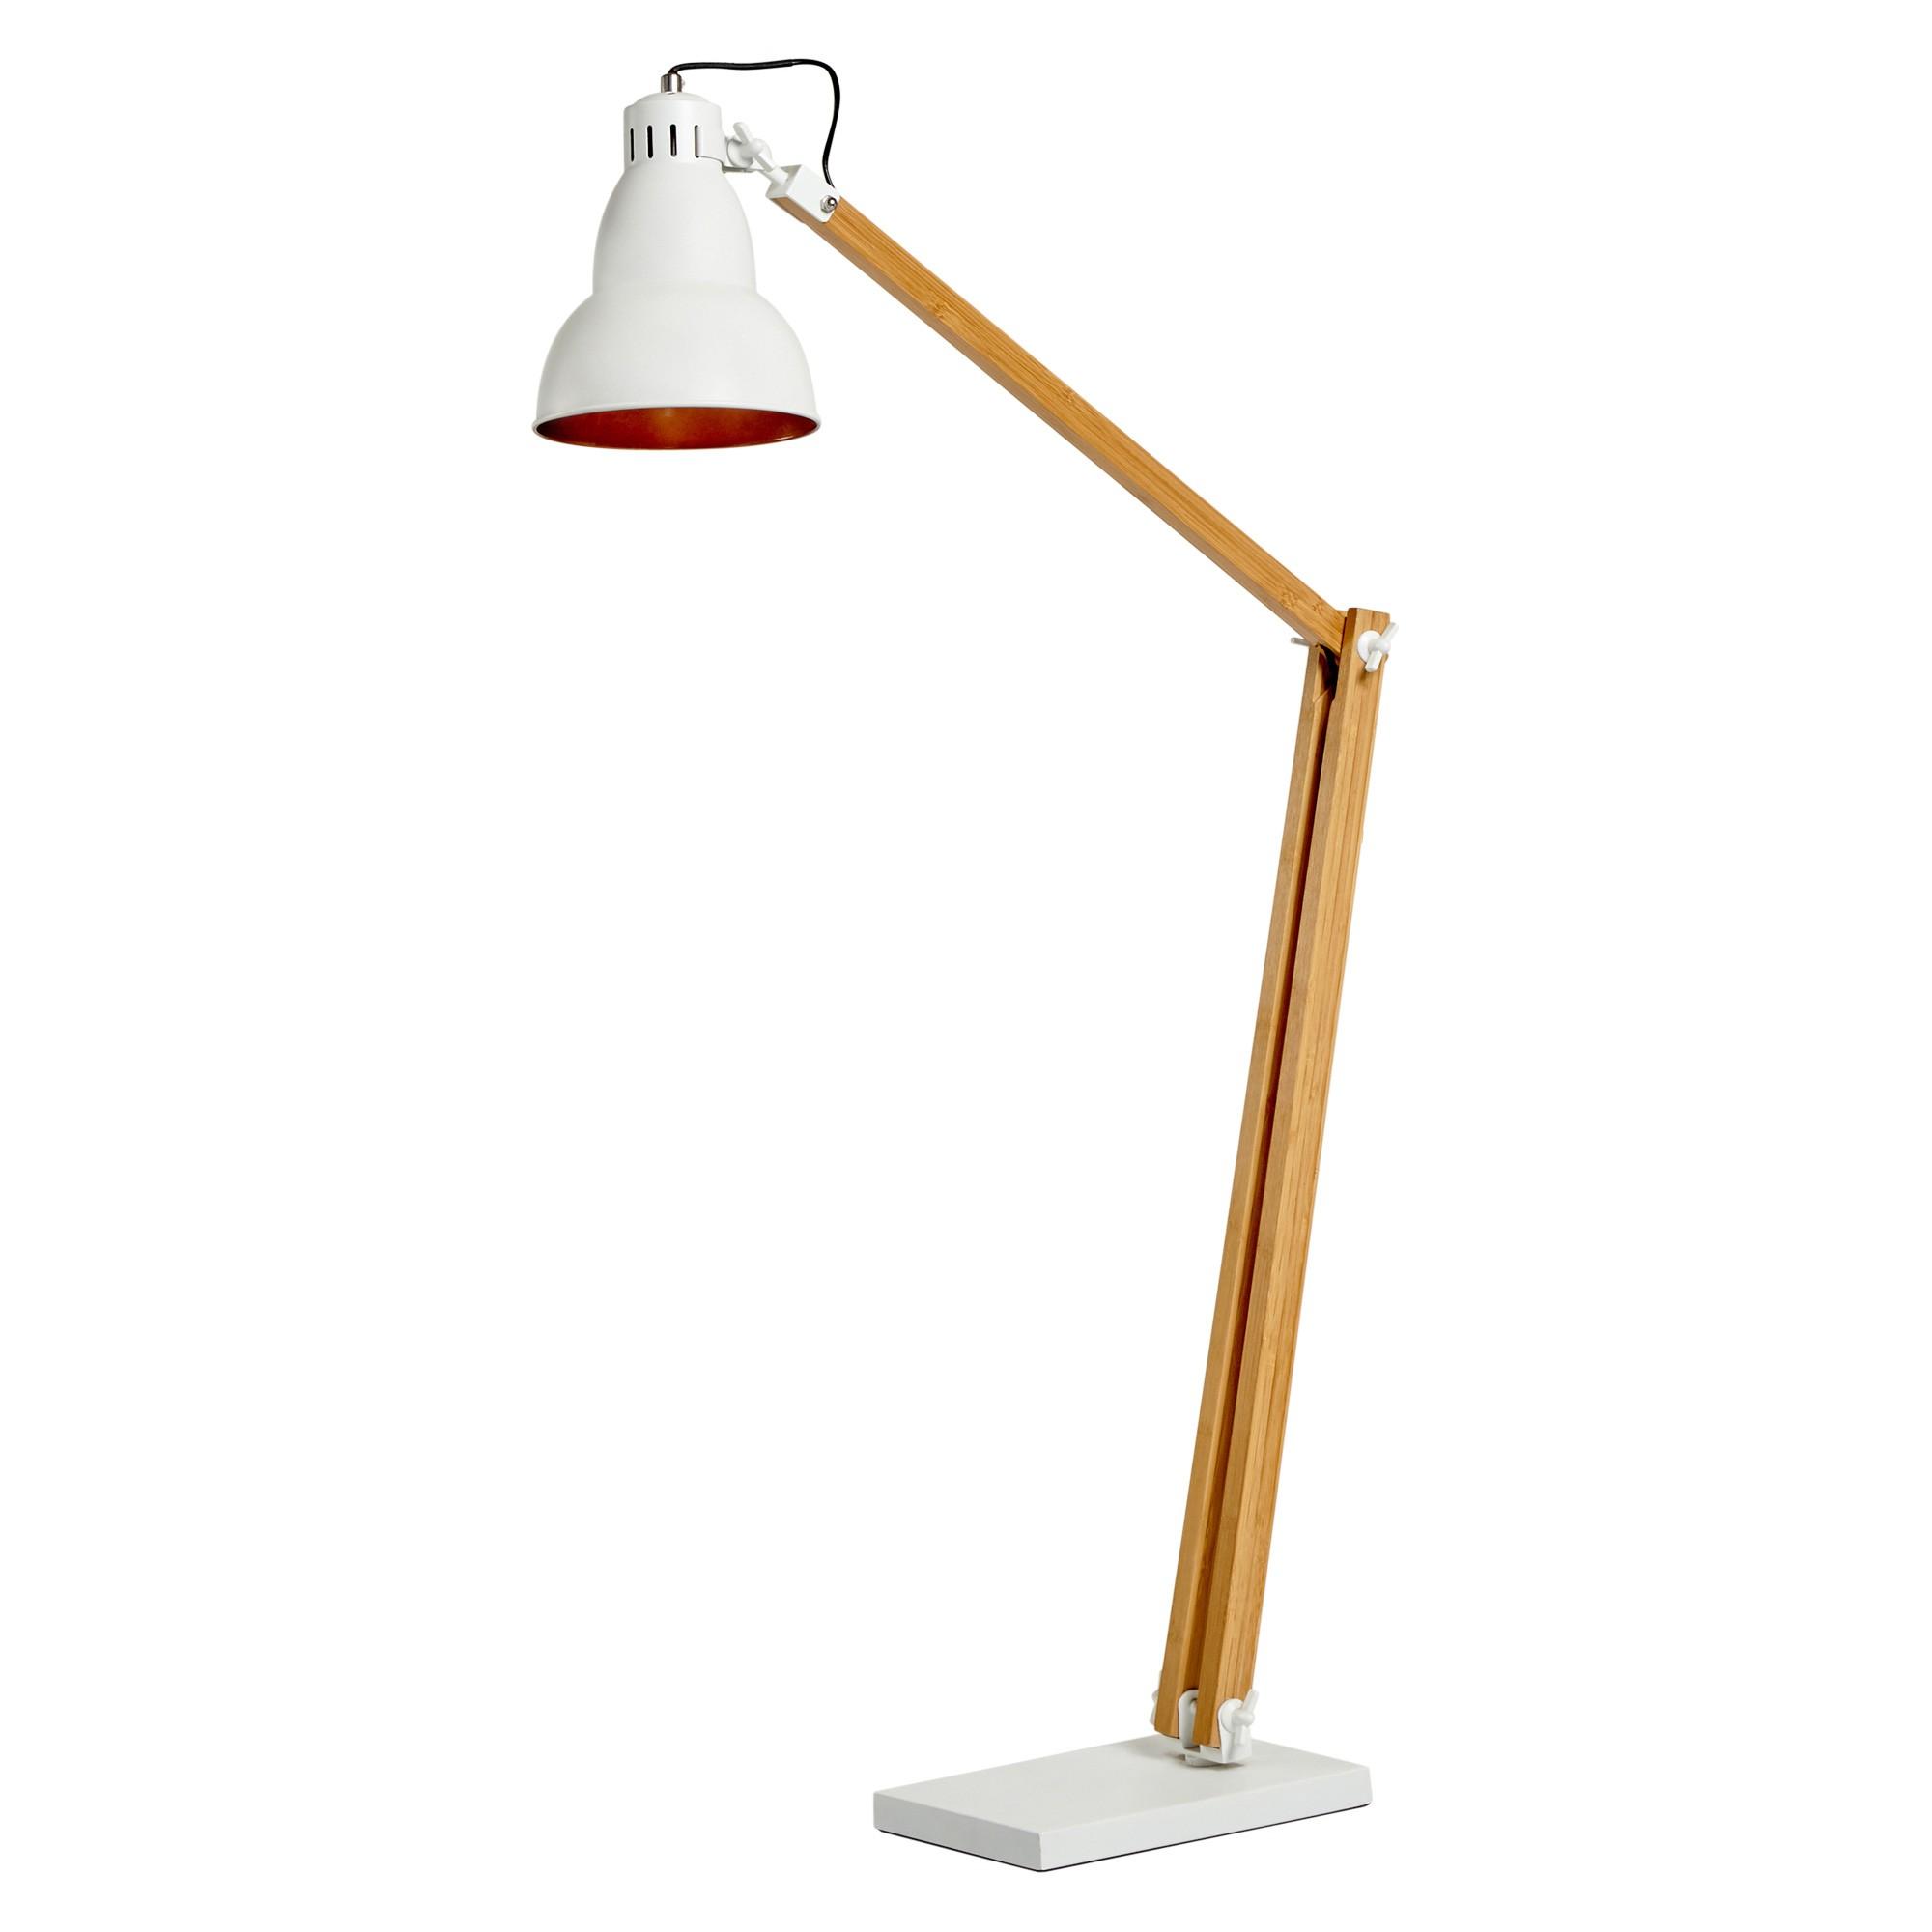 Bloomberg Metal & Timber Adjustable Floor Lamp, White / Natural